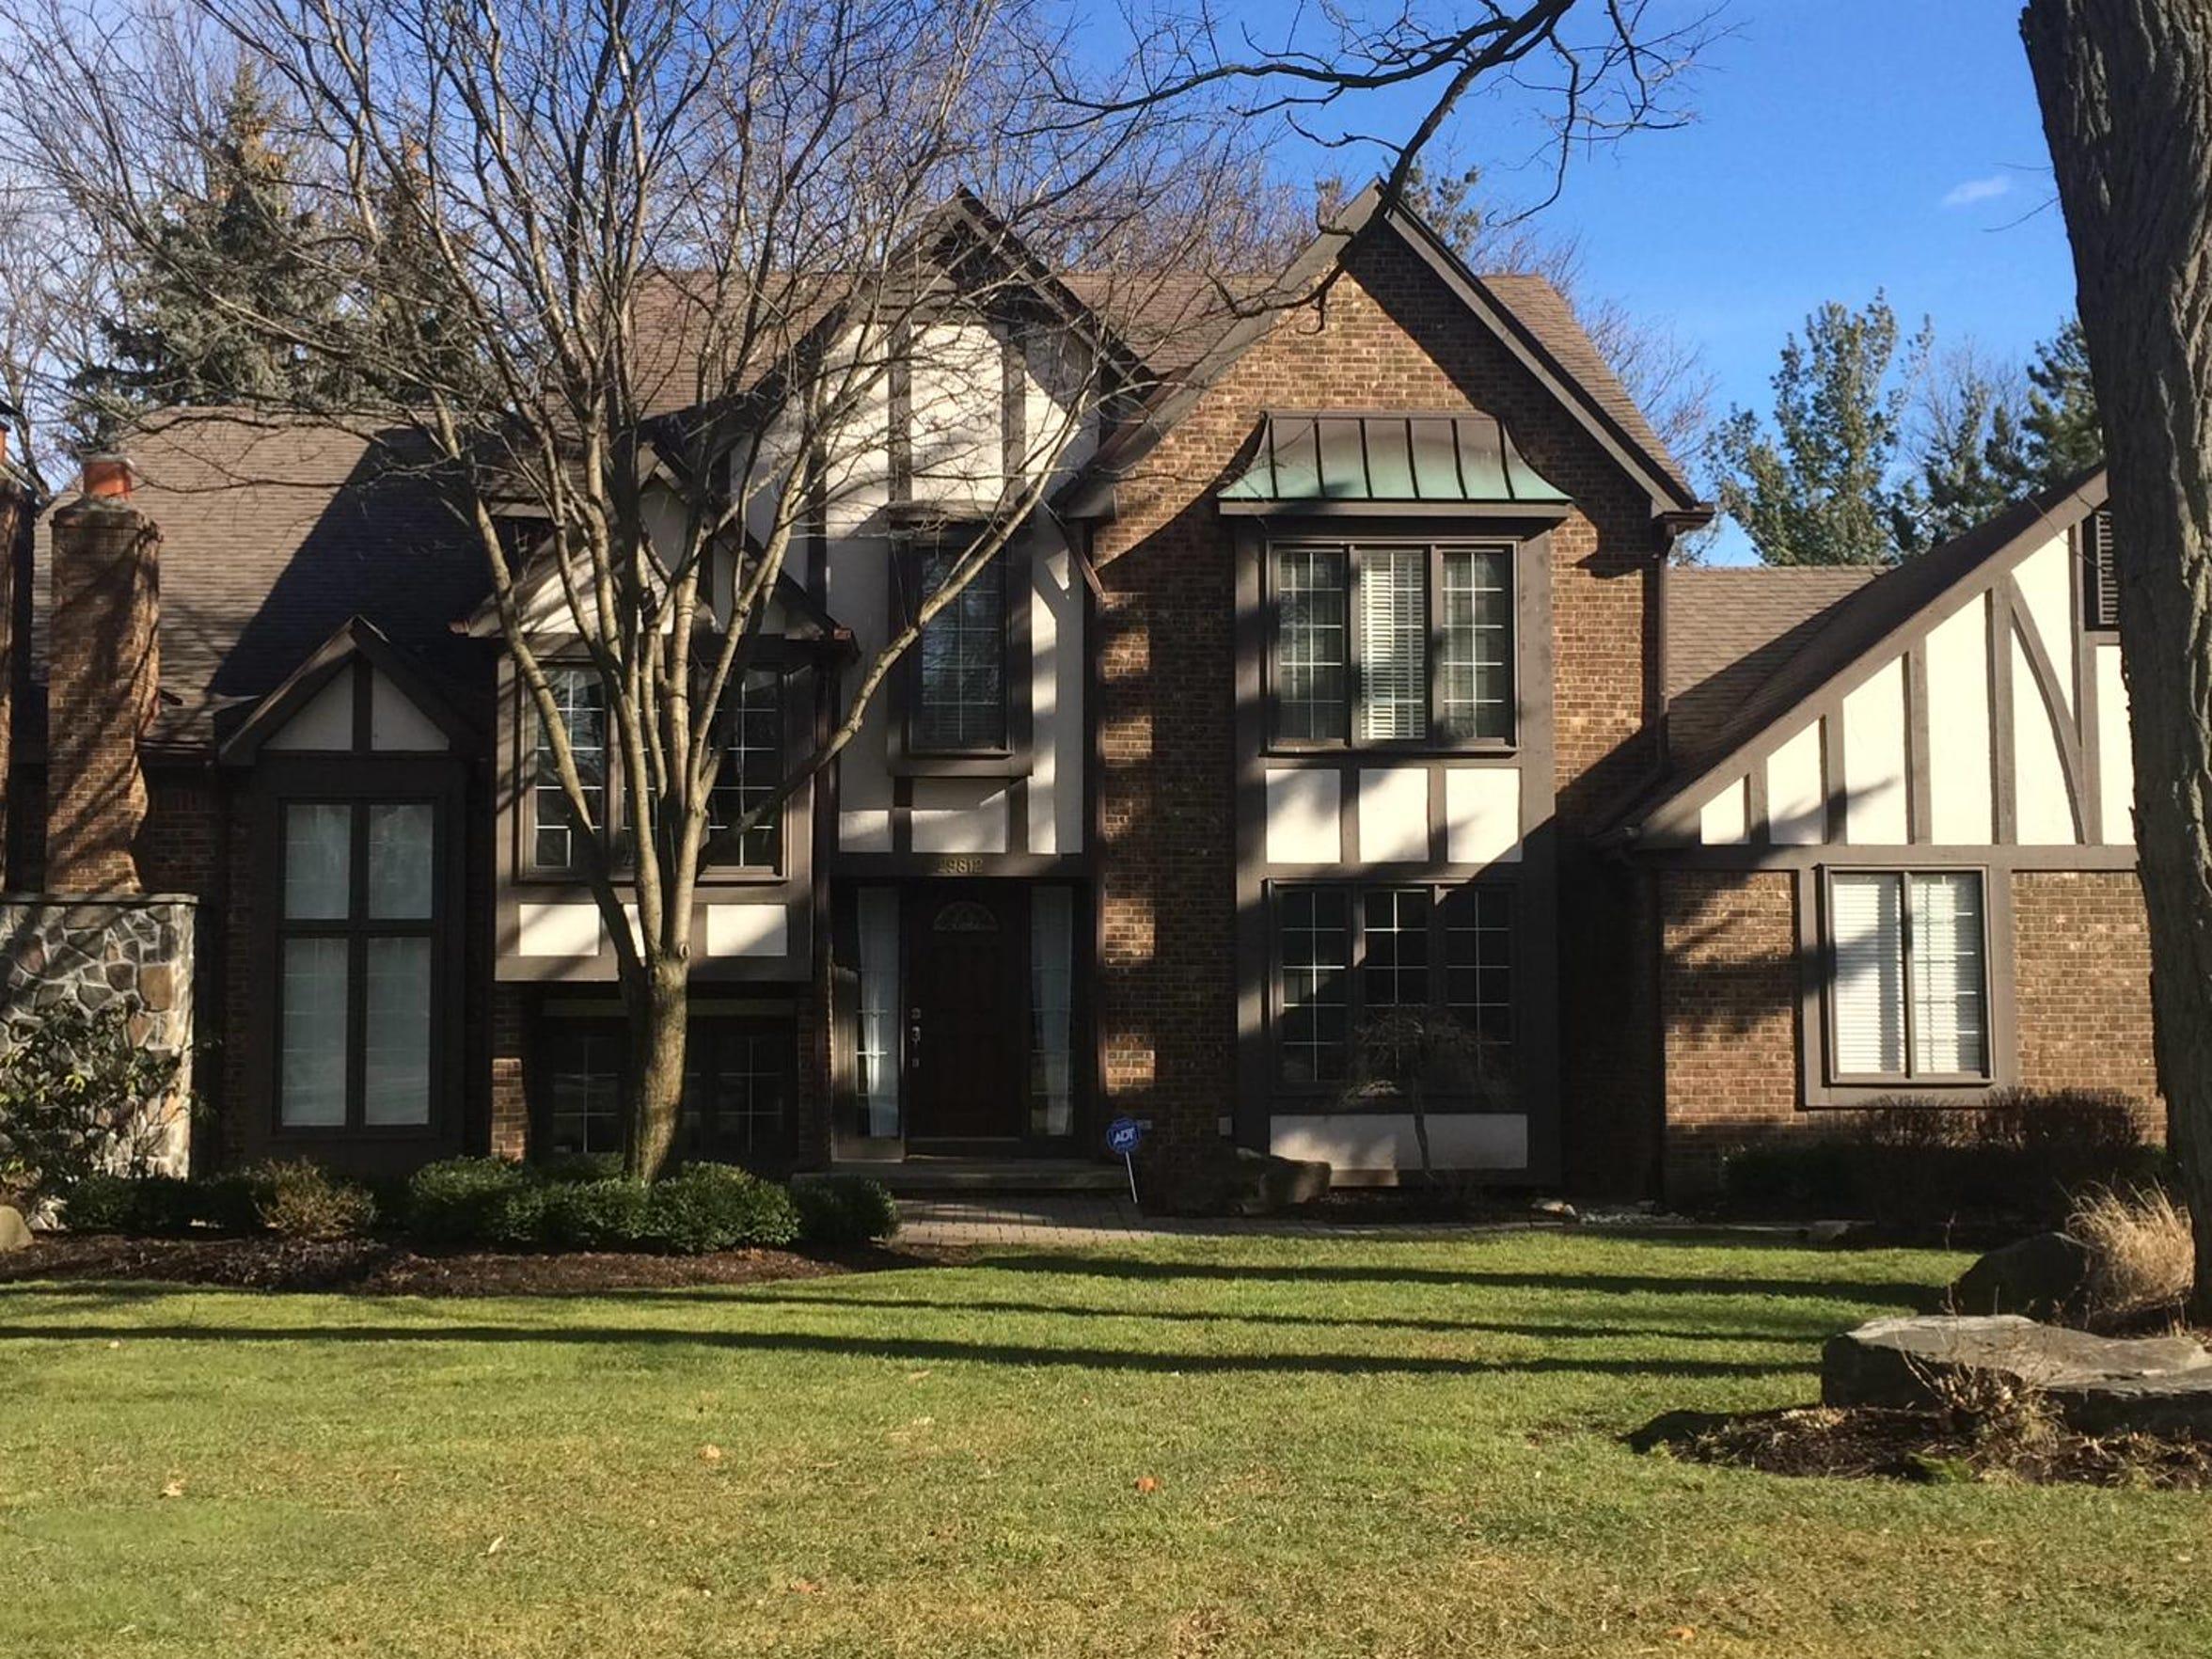 This is the Farmington Hills house where Bob and Nancy